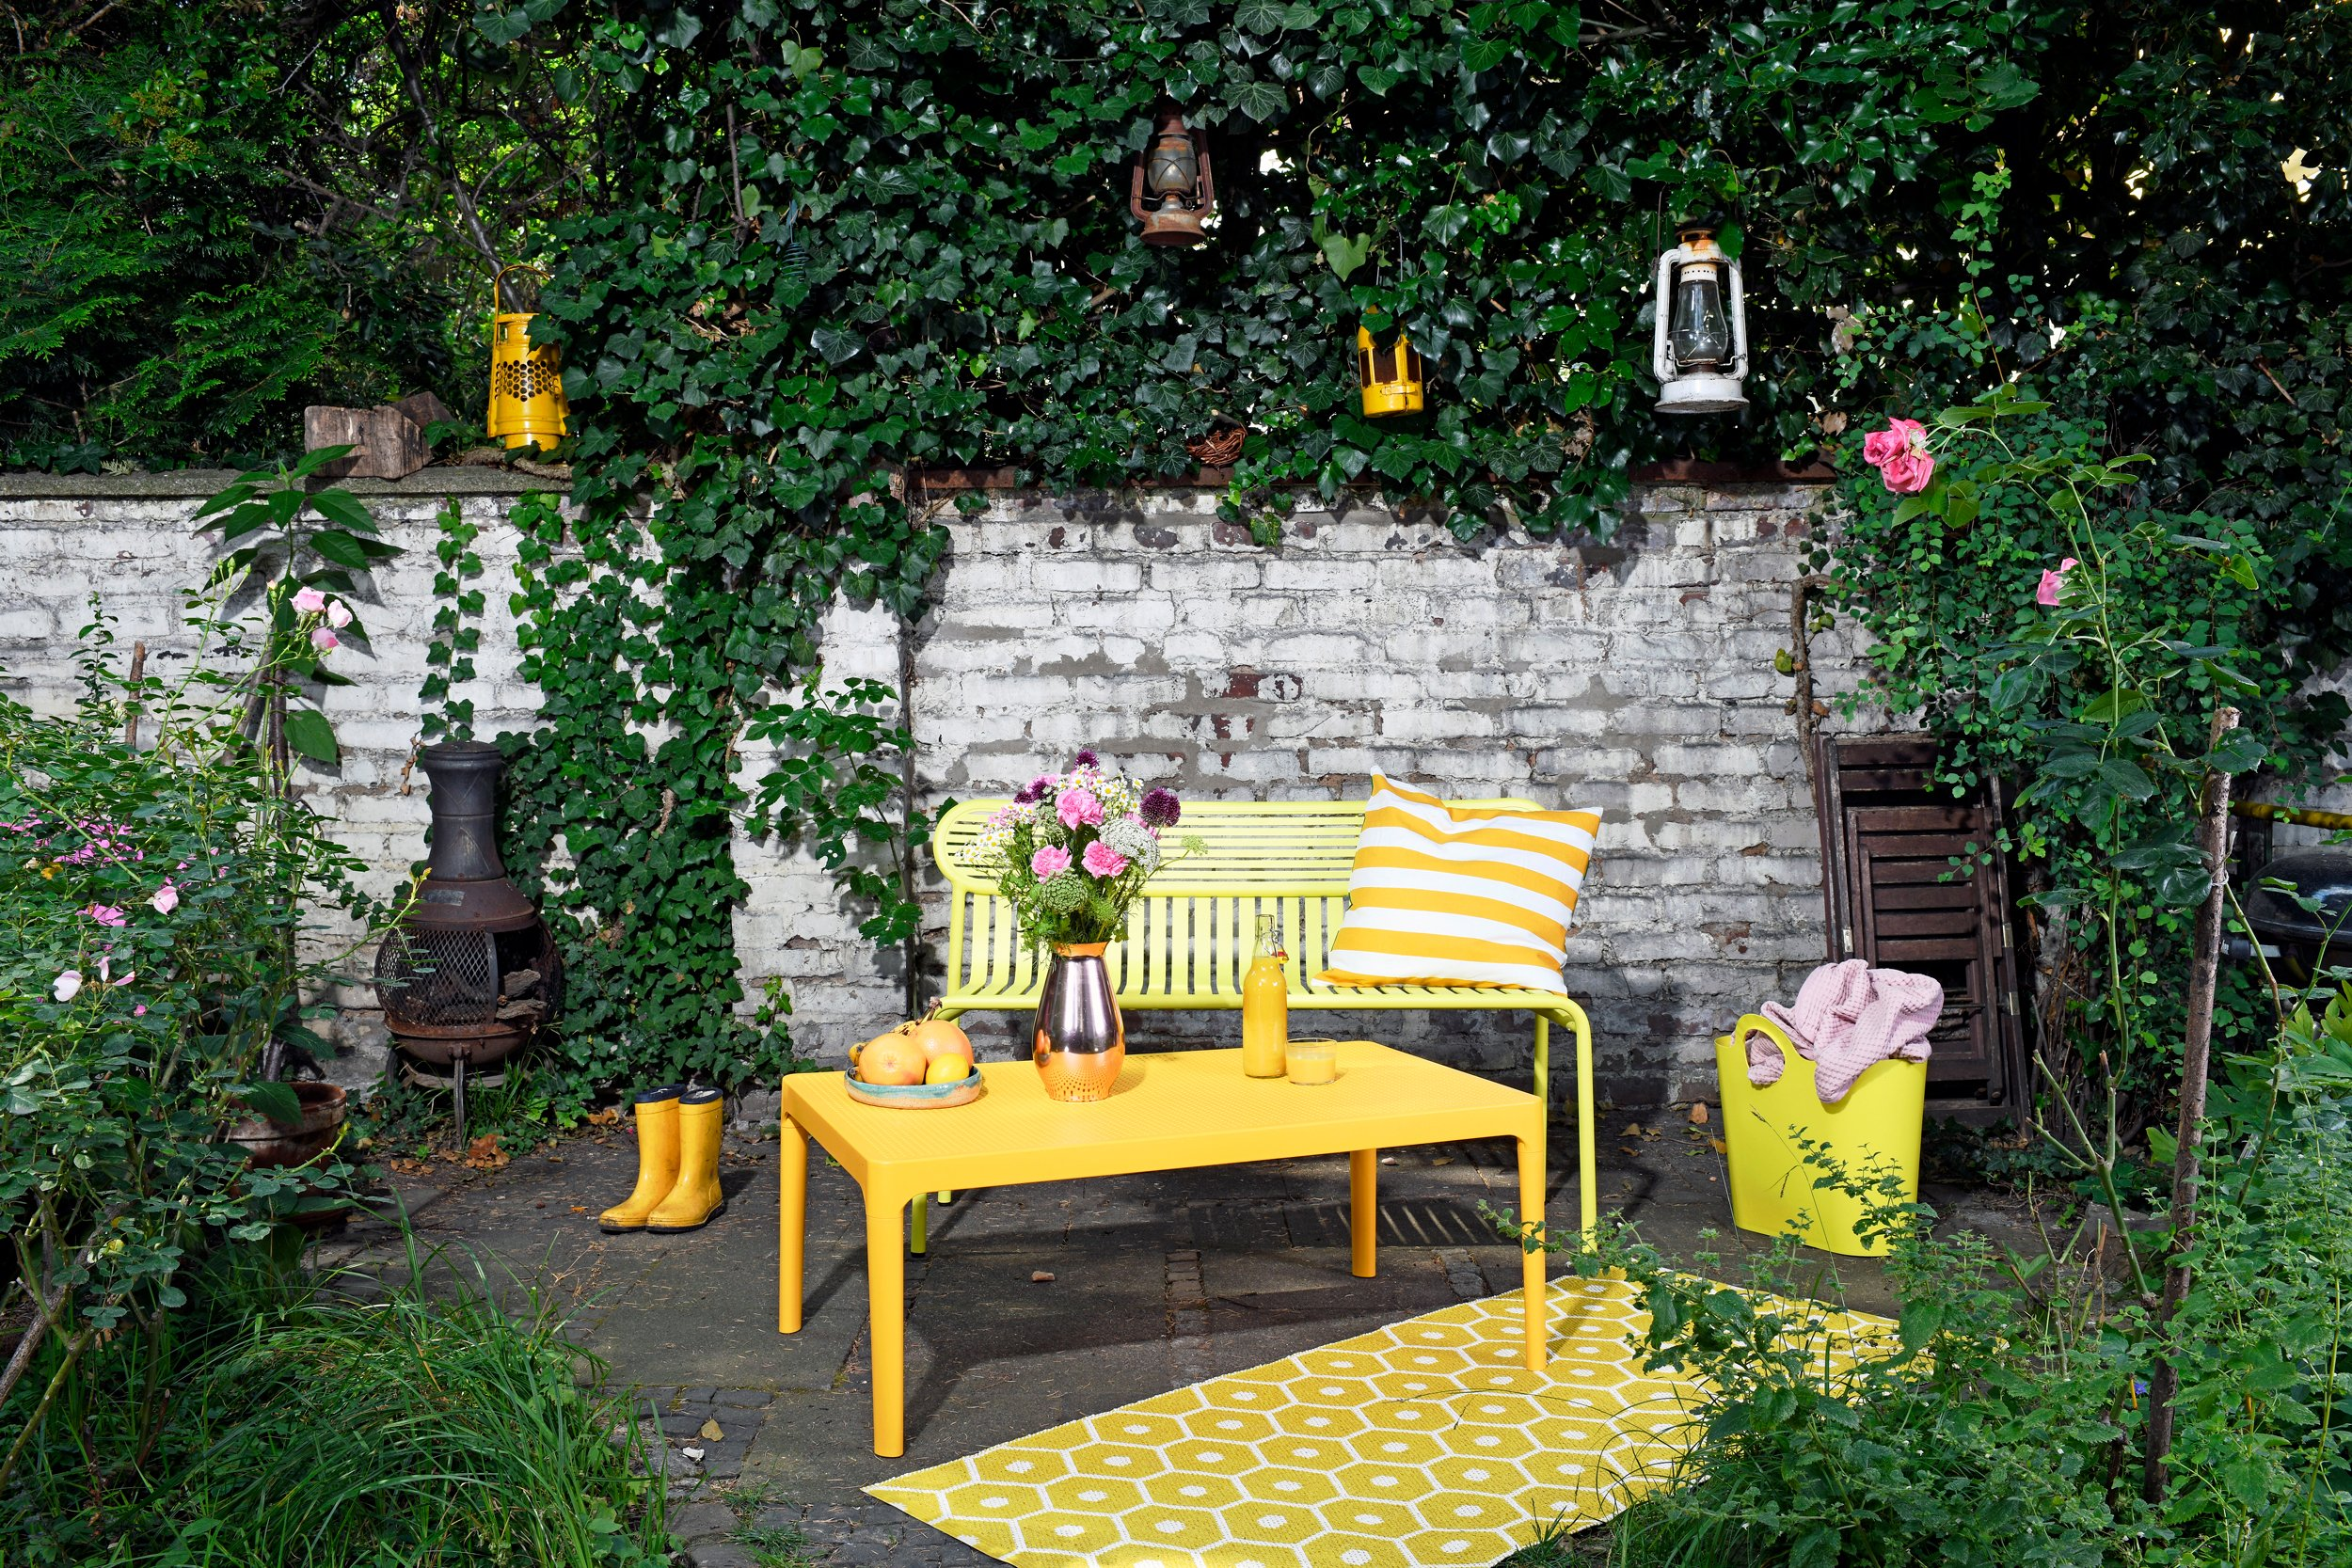 https://farconsulting.de/wp-content/uploads/2020/03/07_SummerStories_Story-4_City-Gardening.jpg